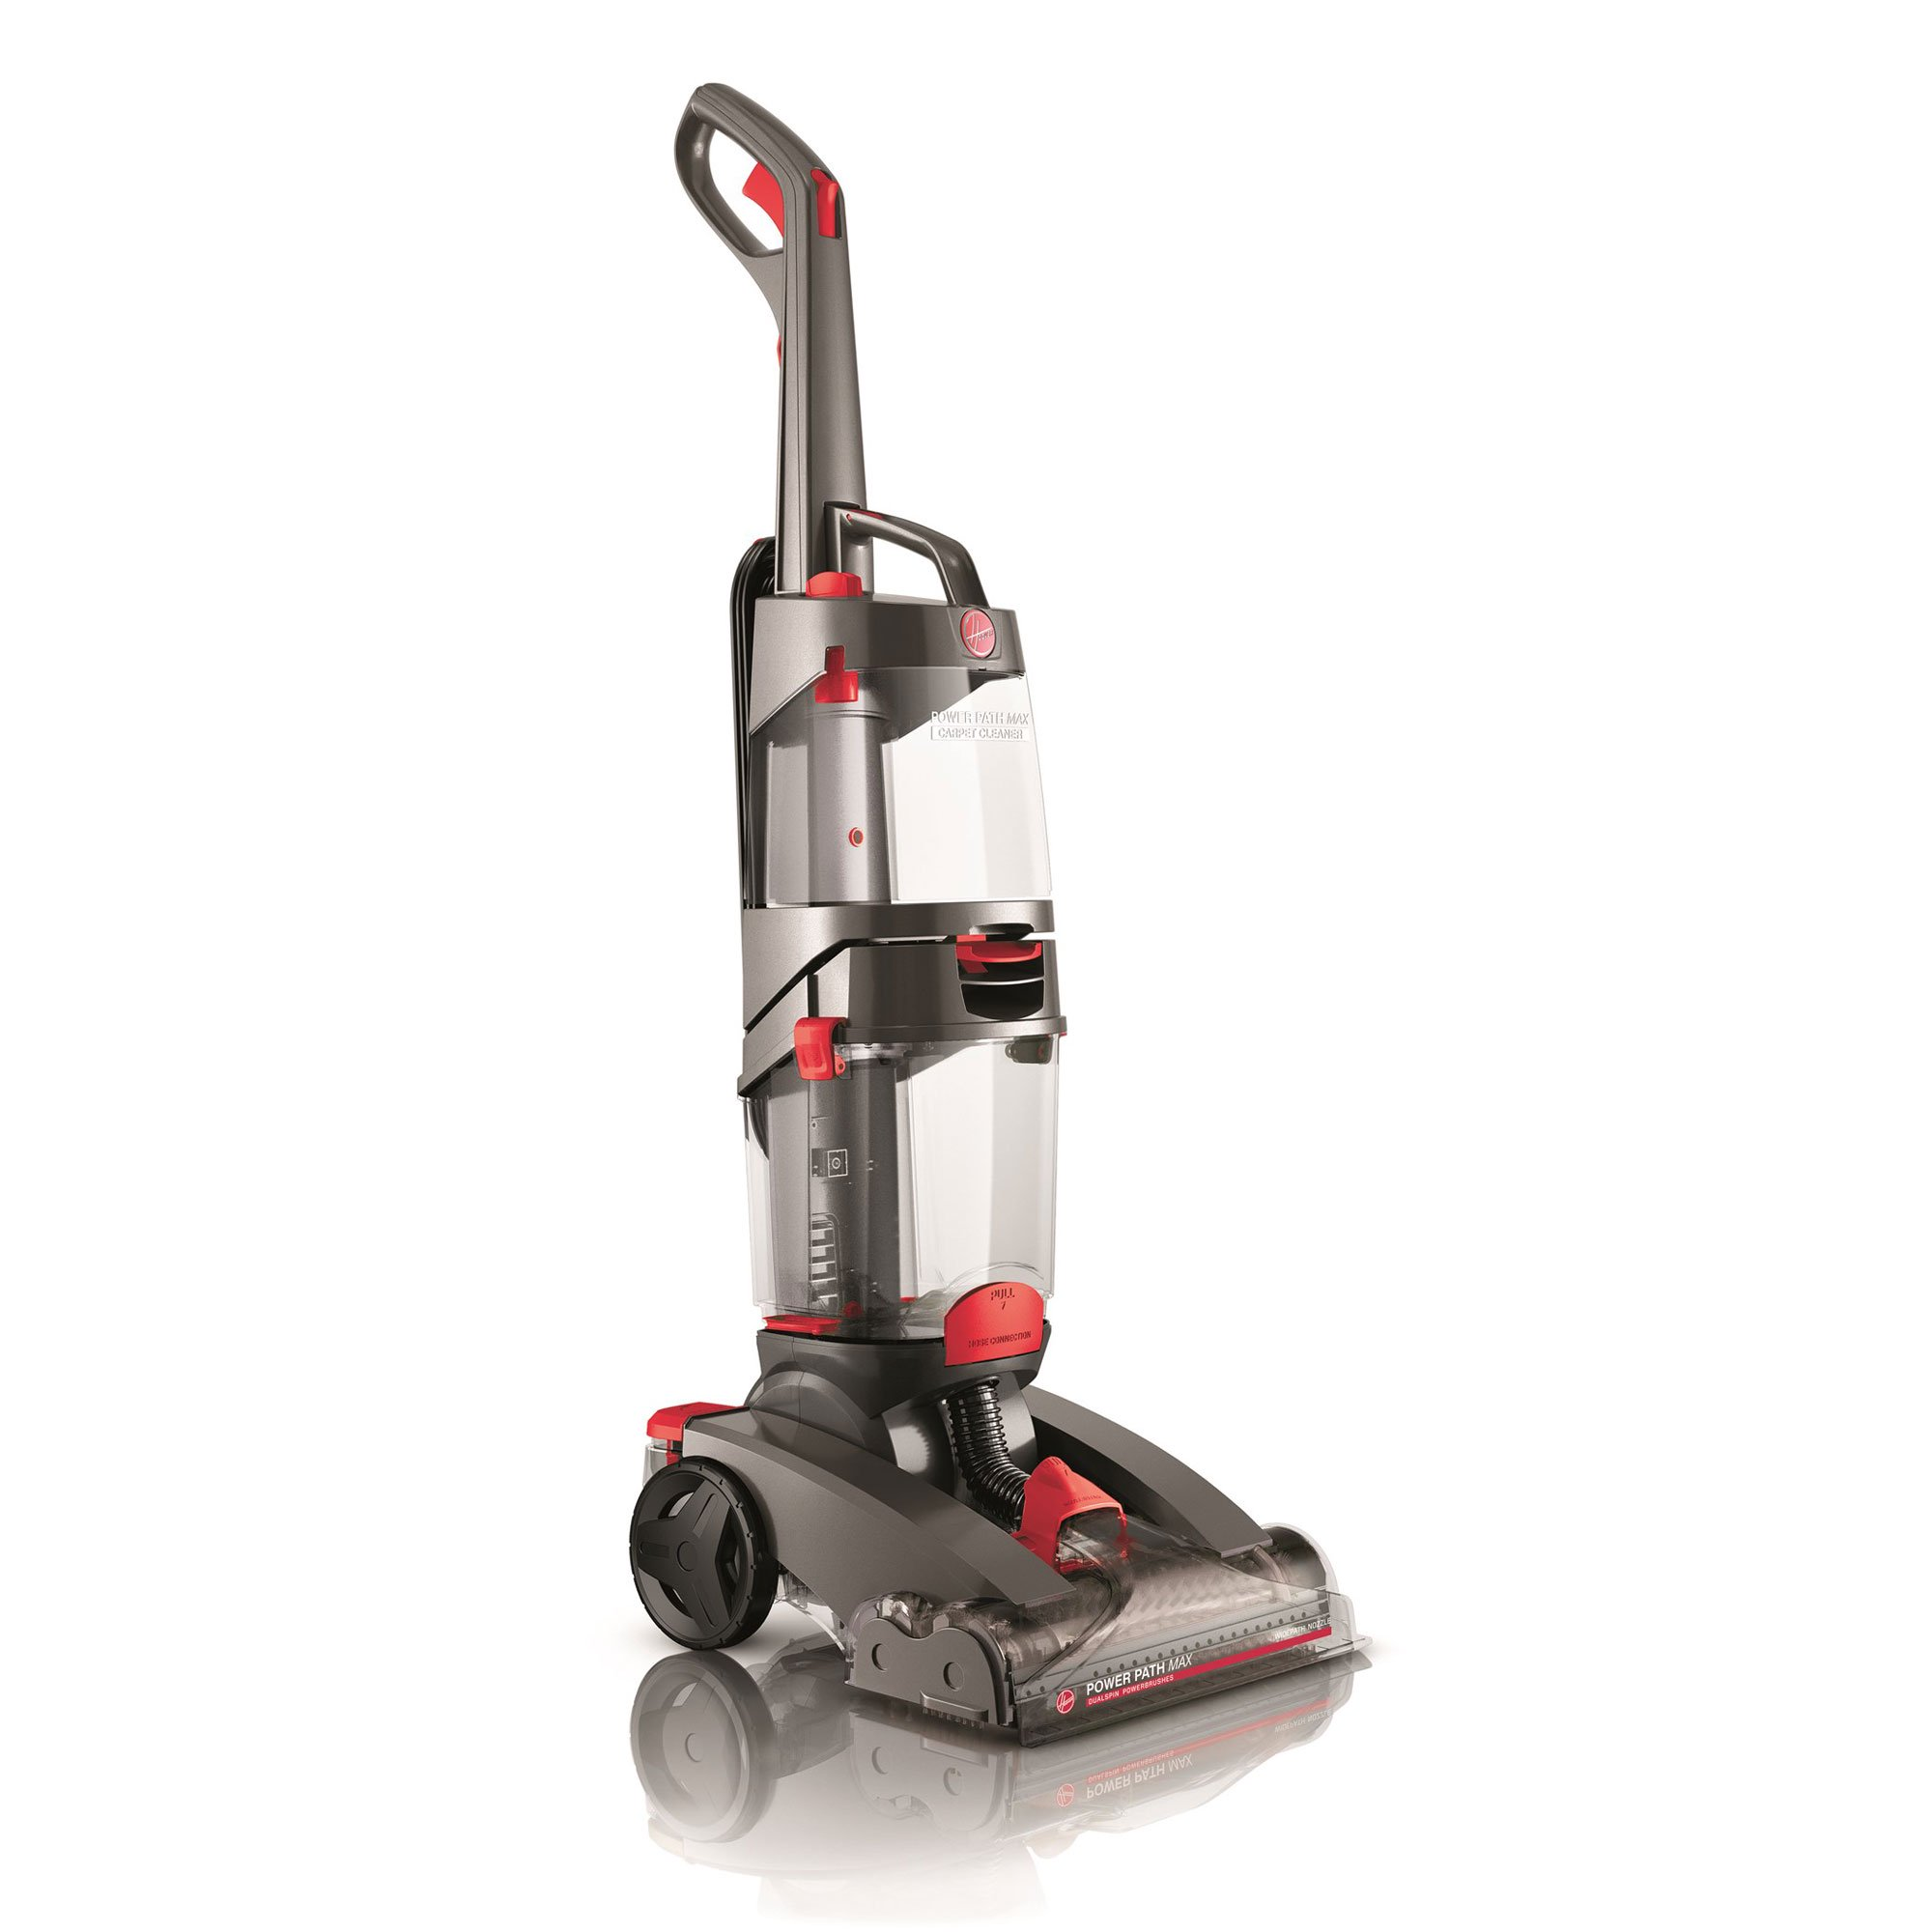 Hoover FH51002 1 Gallon Dual Power Path Max Advanced Pet Upright Carpet Cleaner | Walmart Canada